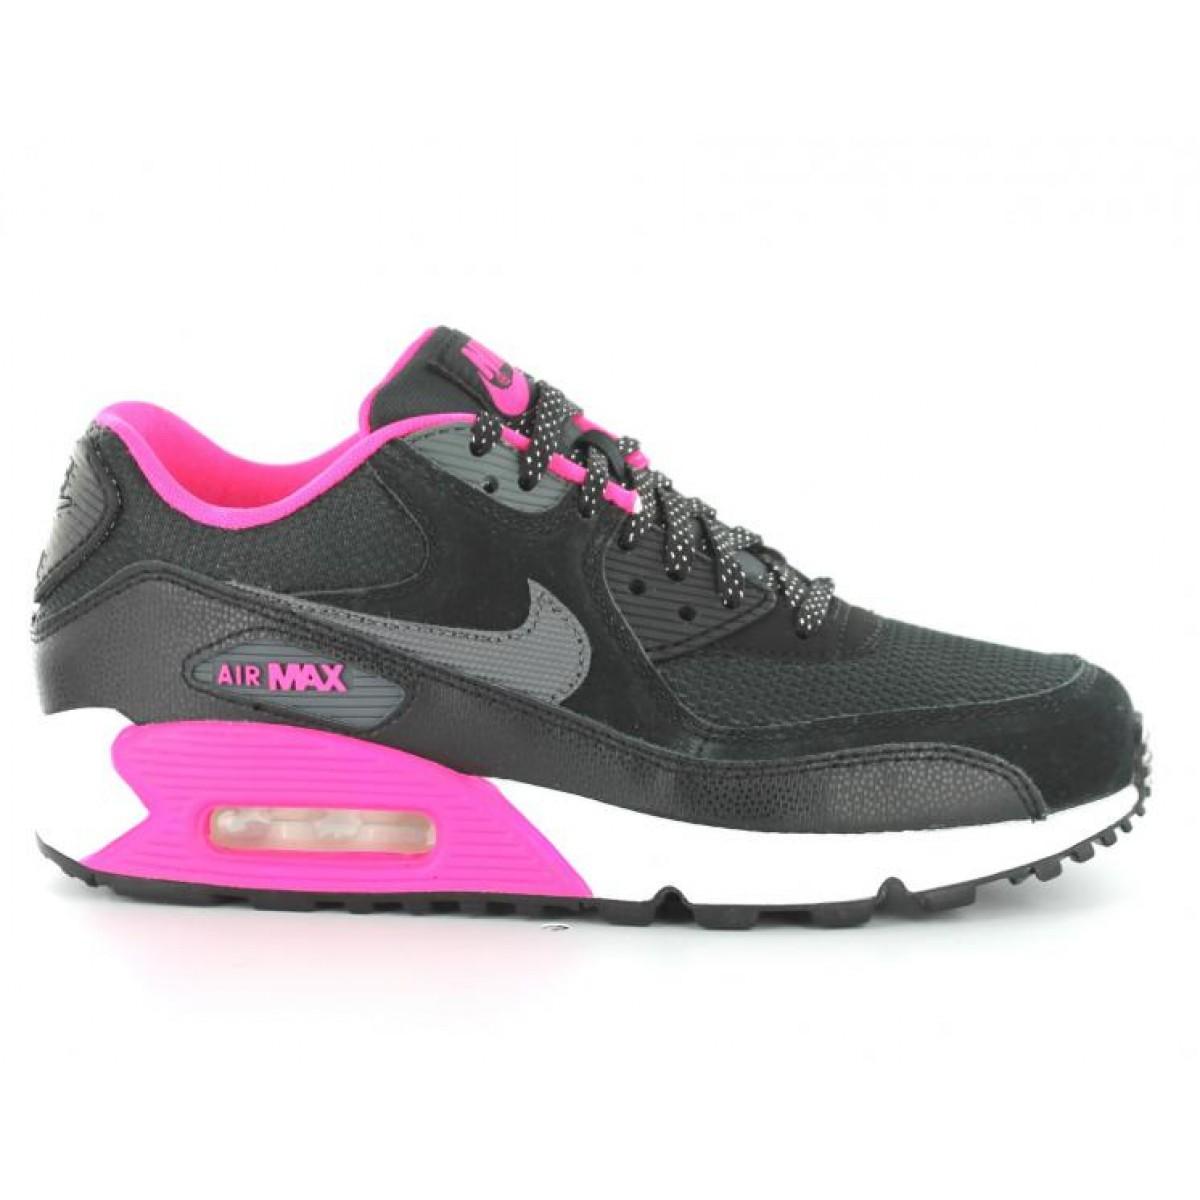 finest selection d15b0 509e7 Achat  Vente produits Nike Air Max 90 Femme Noir et Rose,Nike Air Max